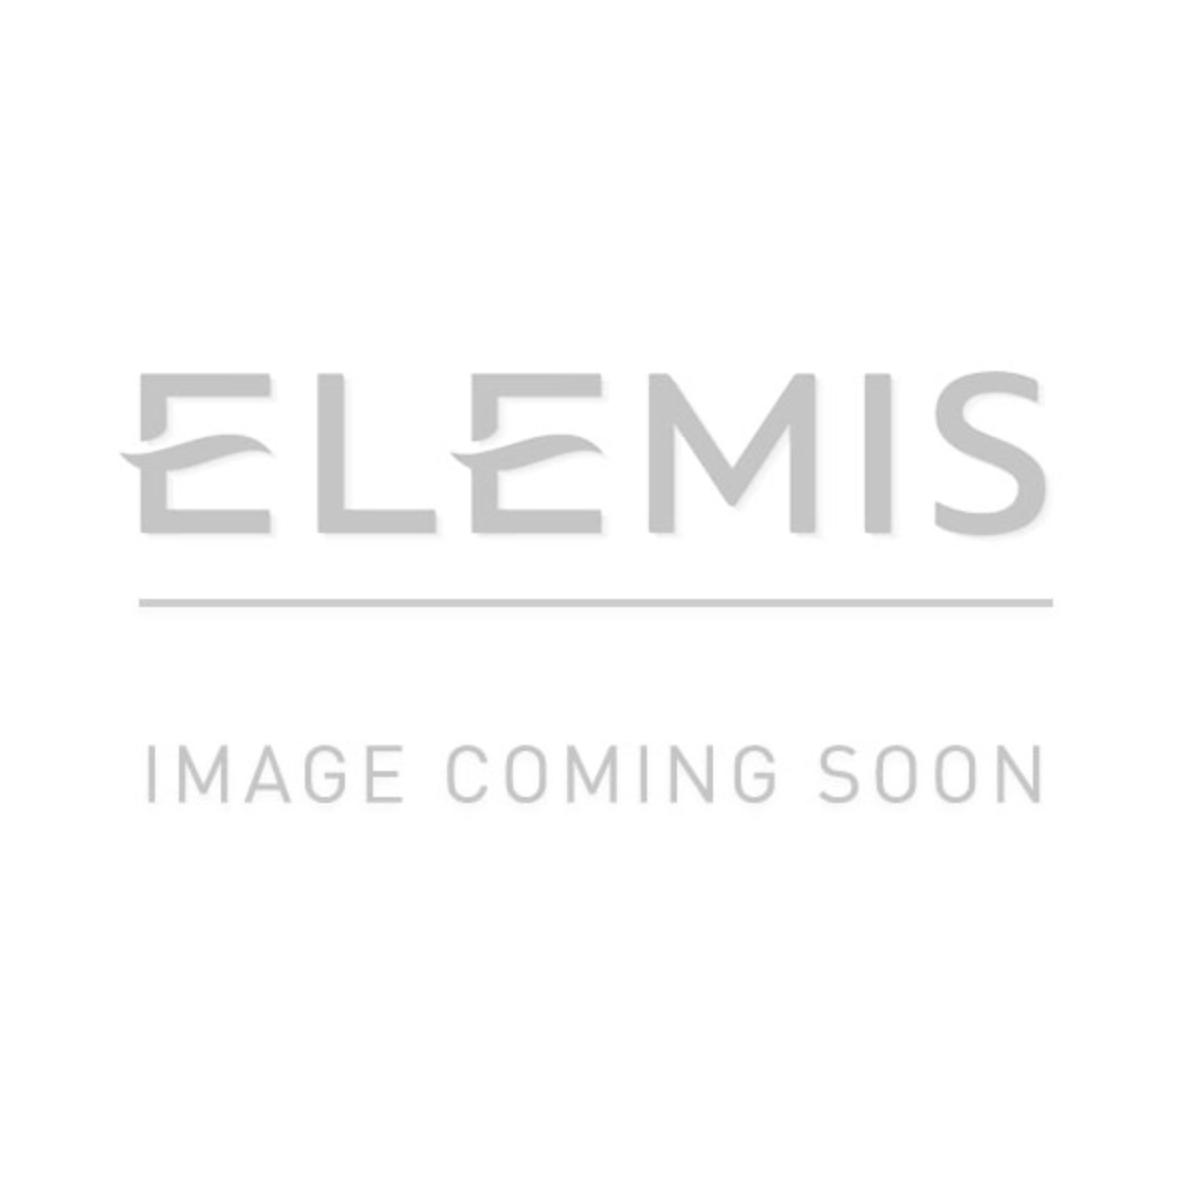 Elemis Spa Reviews